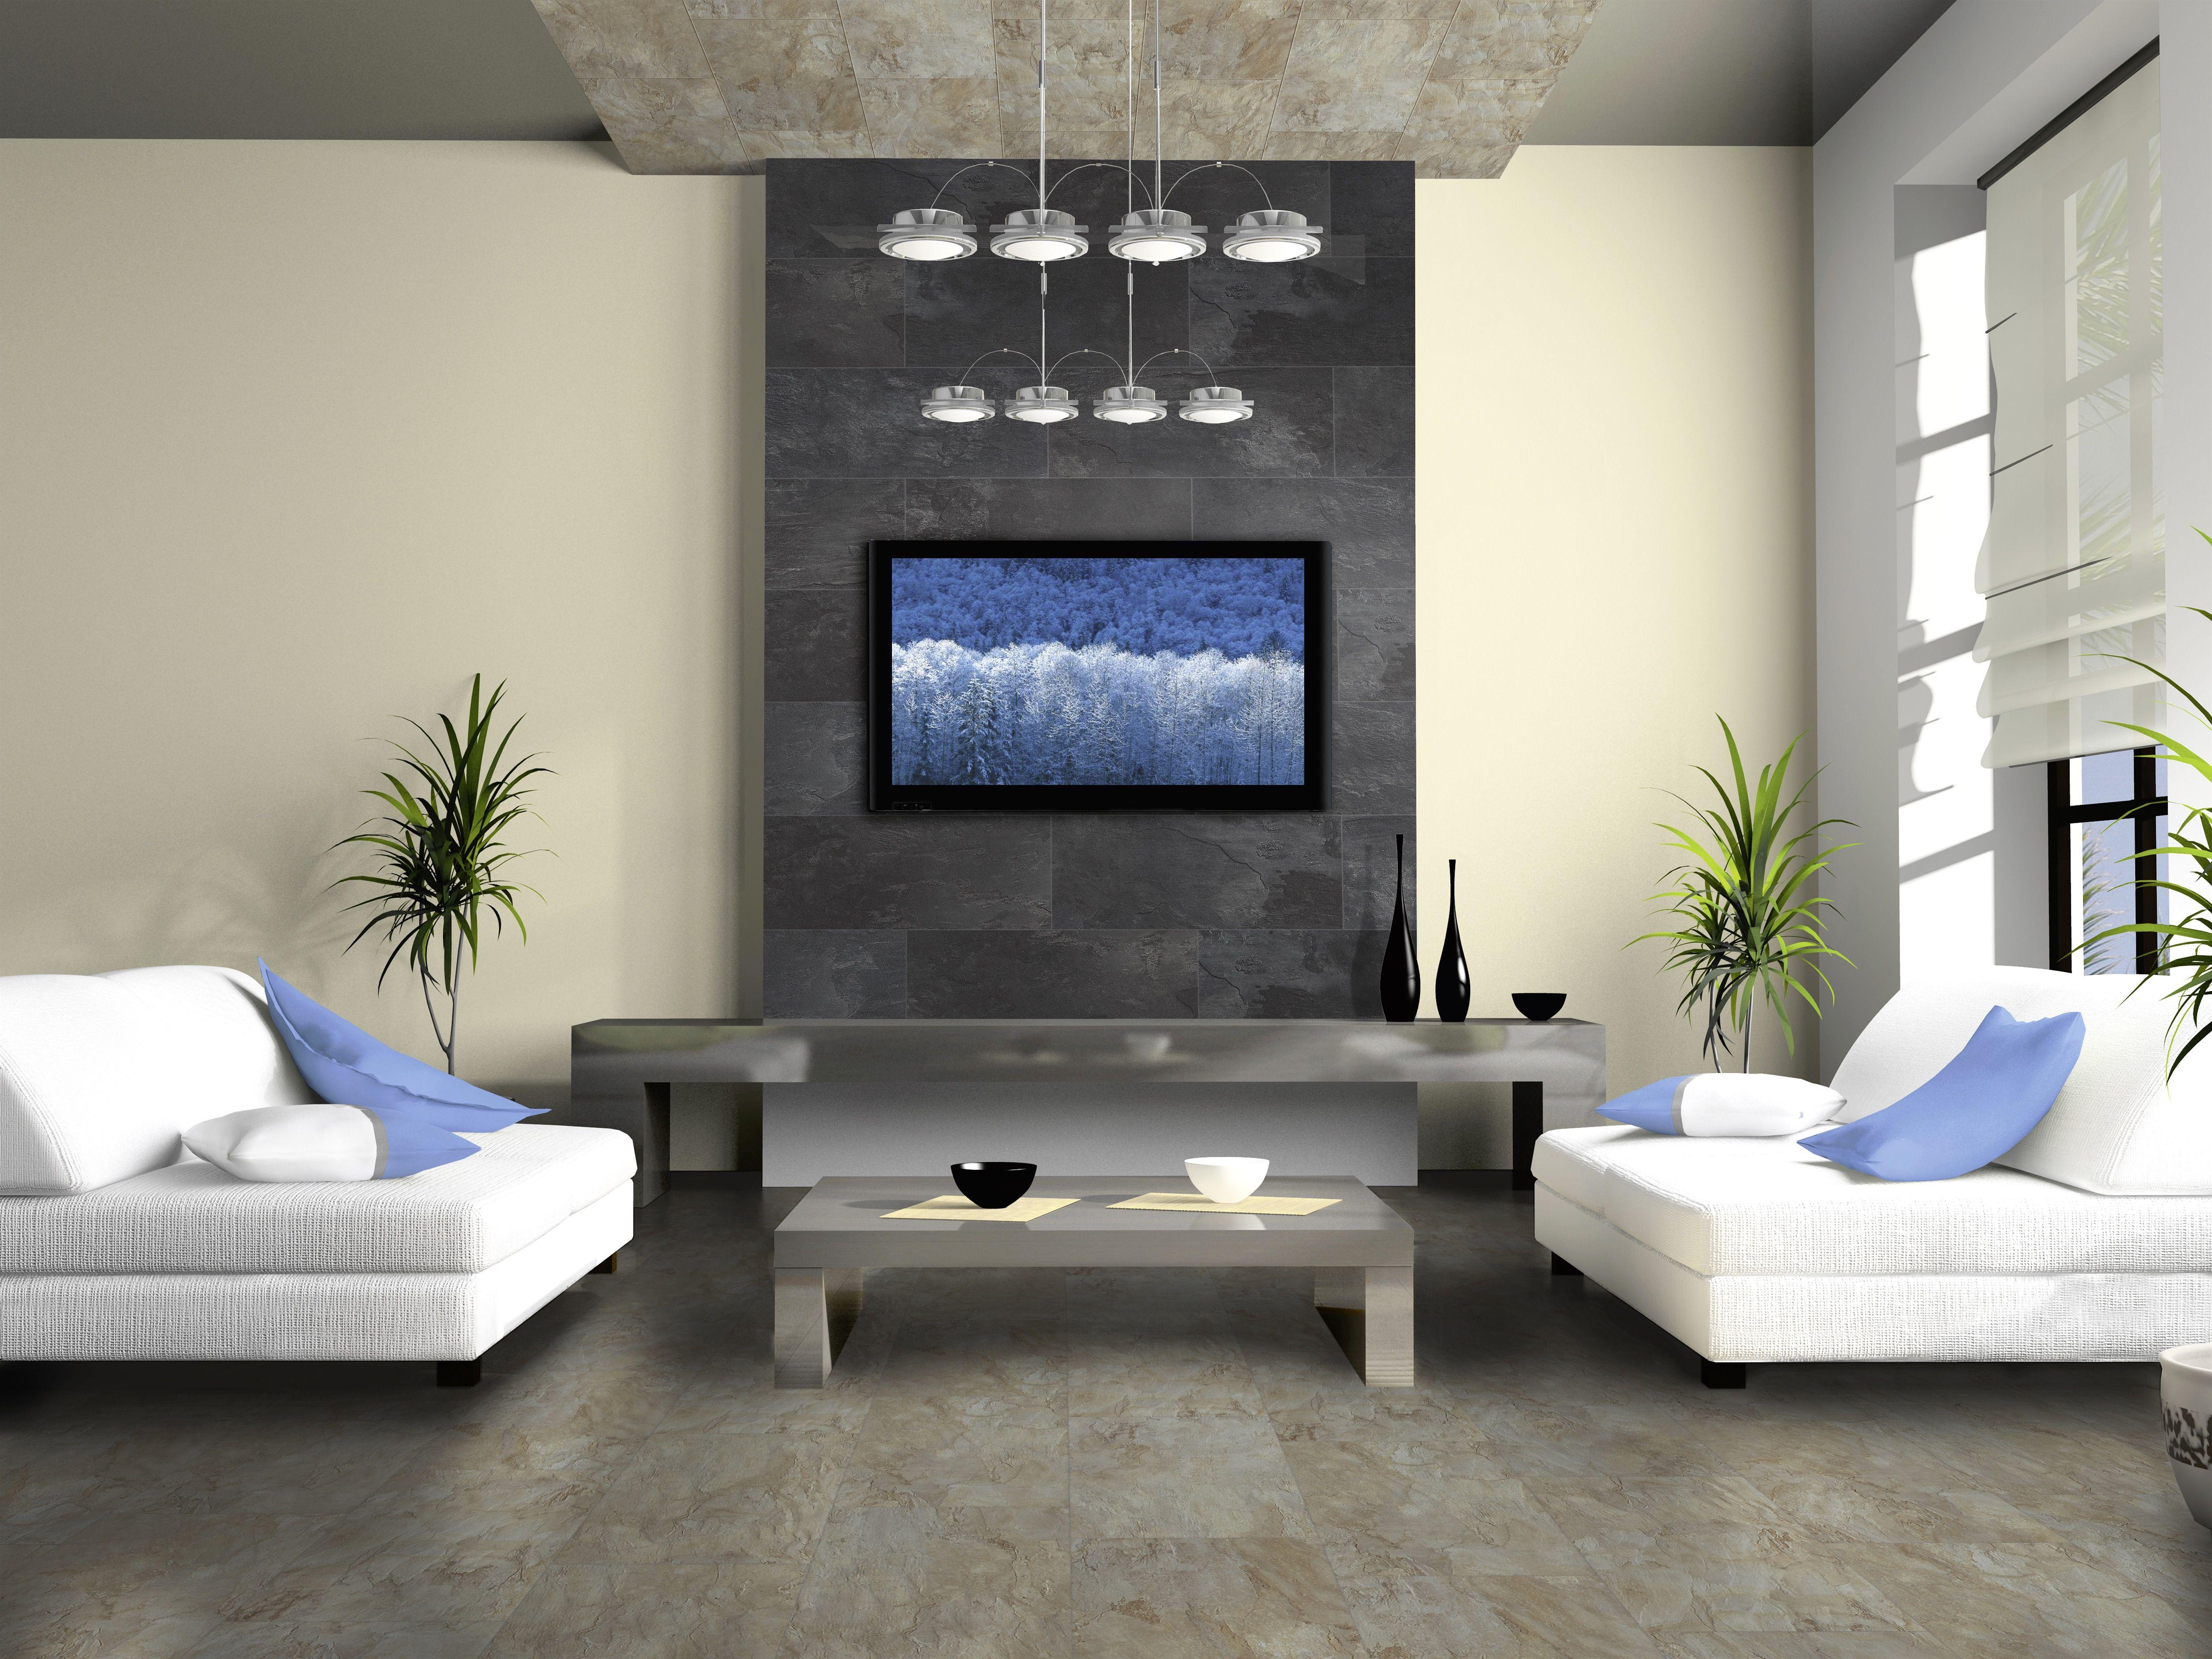 uncategorized:tv wand selber bauen laminat jenseits des glaubens auf